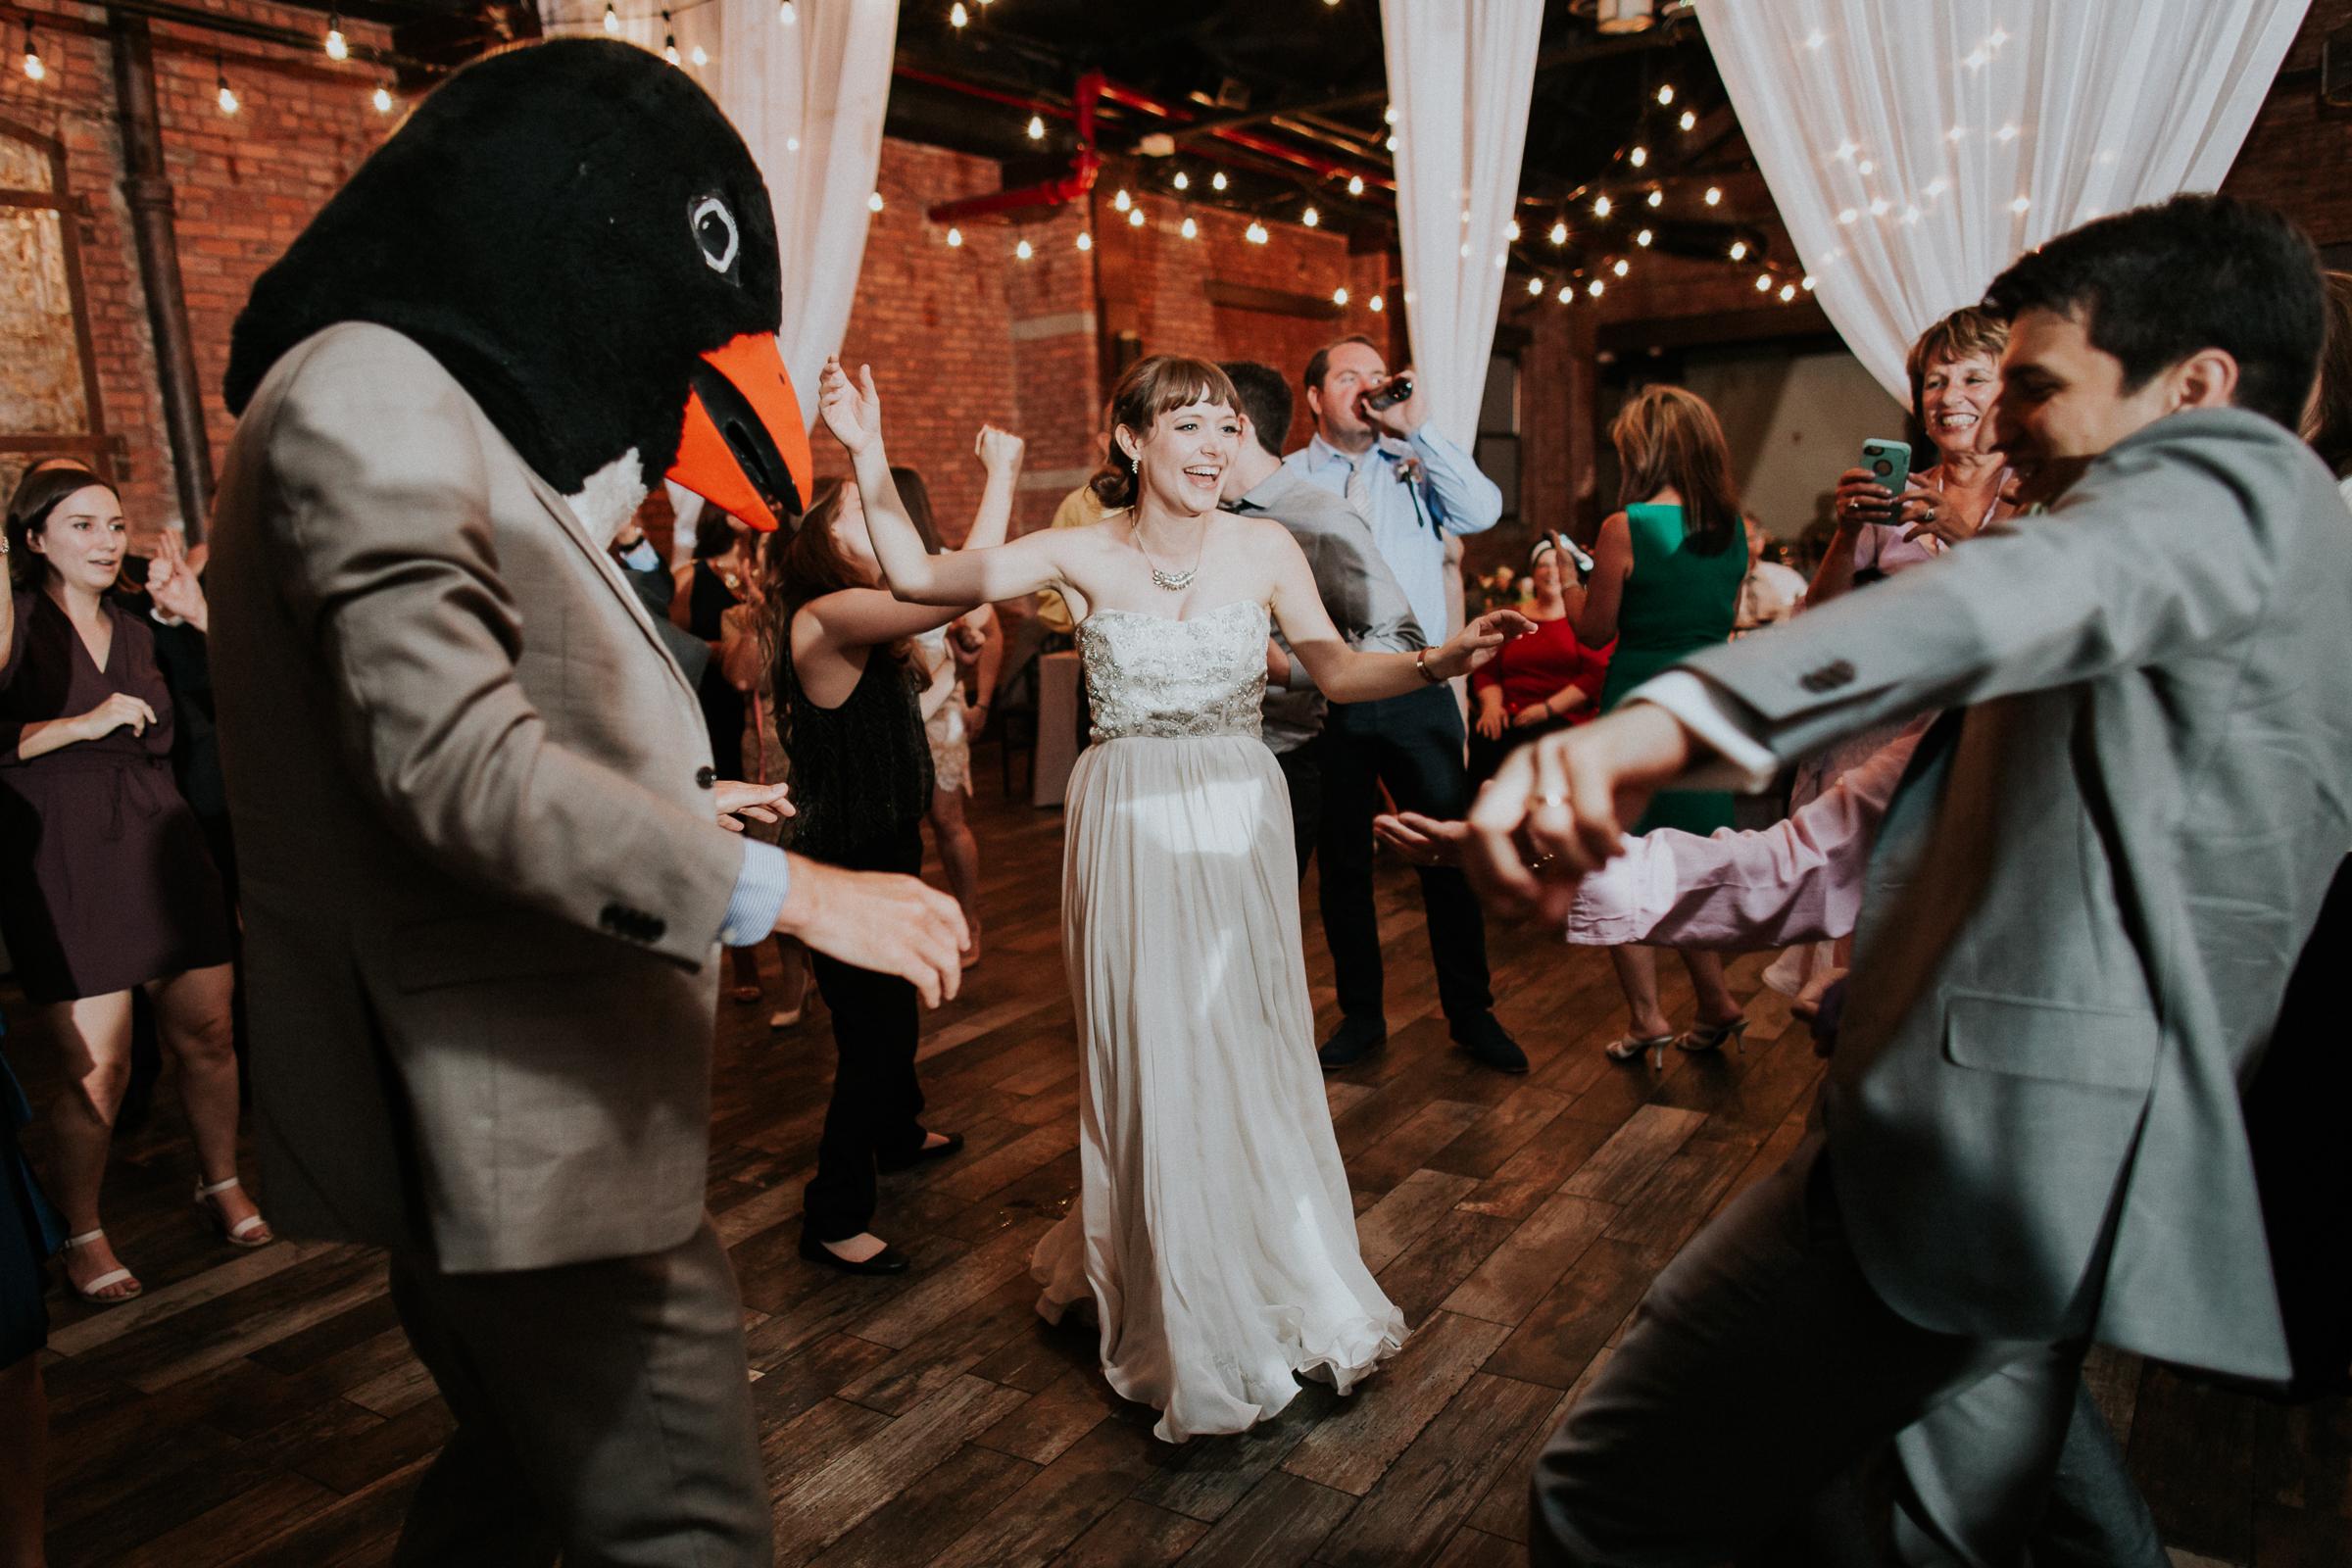 New-York-Documentary-Wedding-Photography-Best-Of-2017-by-Elvira-Kalviste-Photography-99.jpg